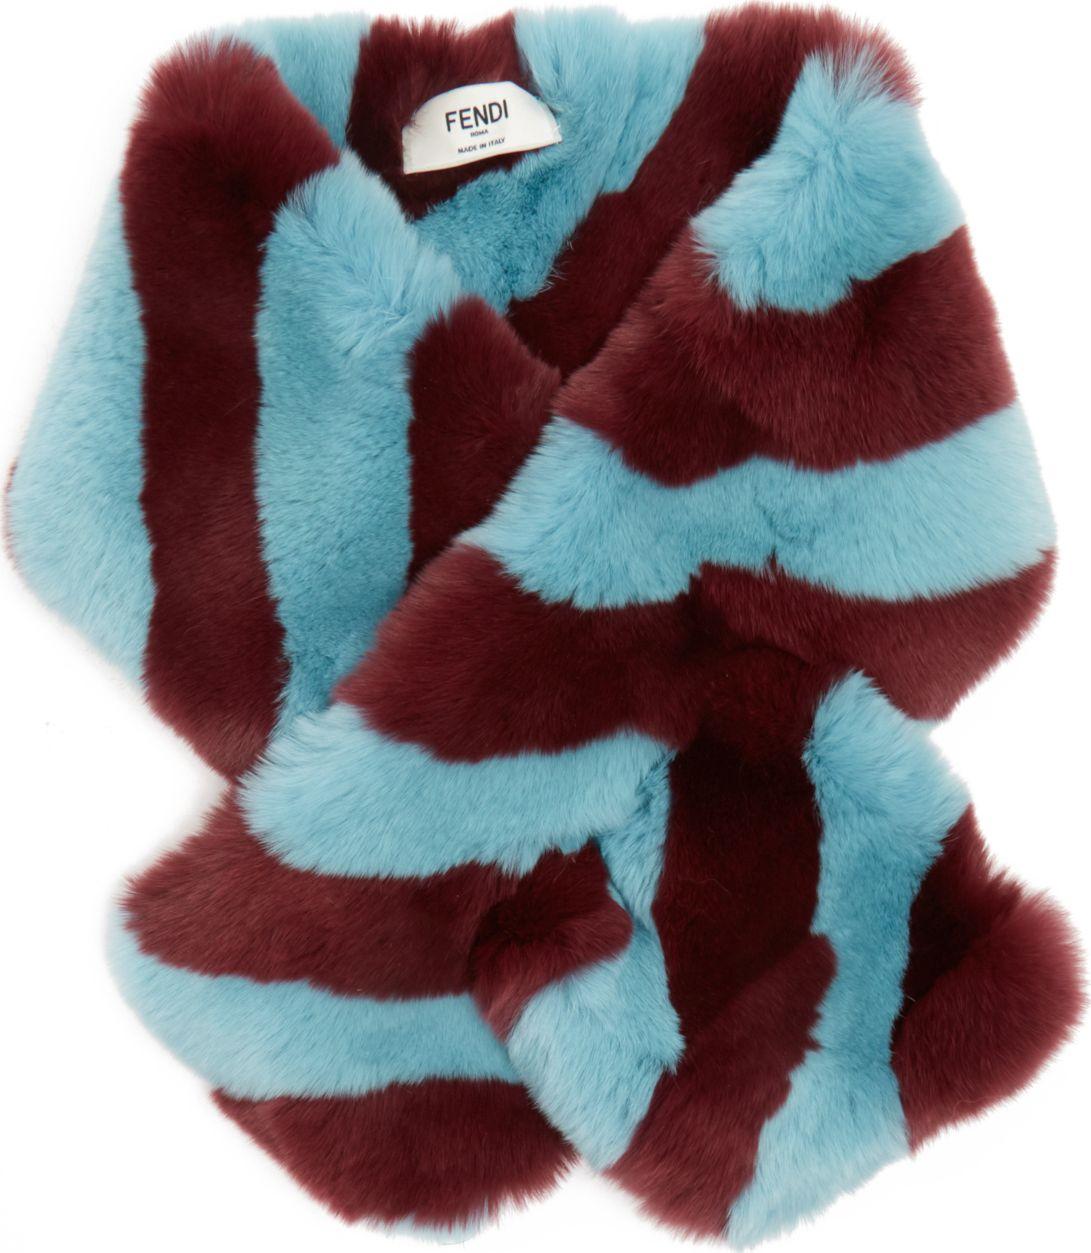 Fendi - Striped fur collar